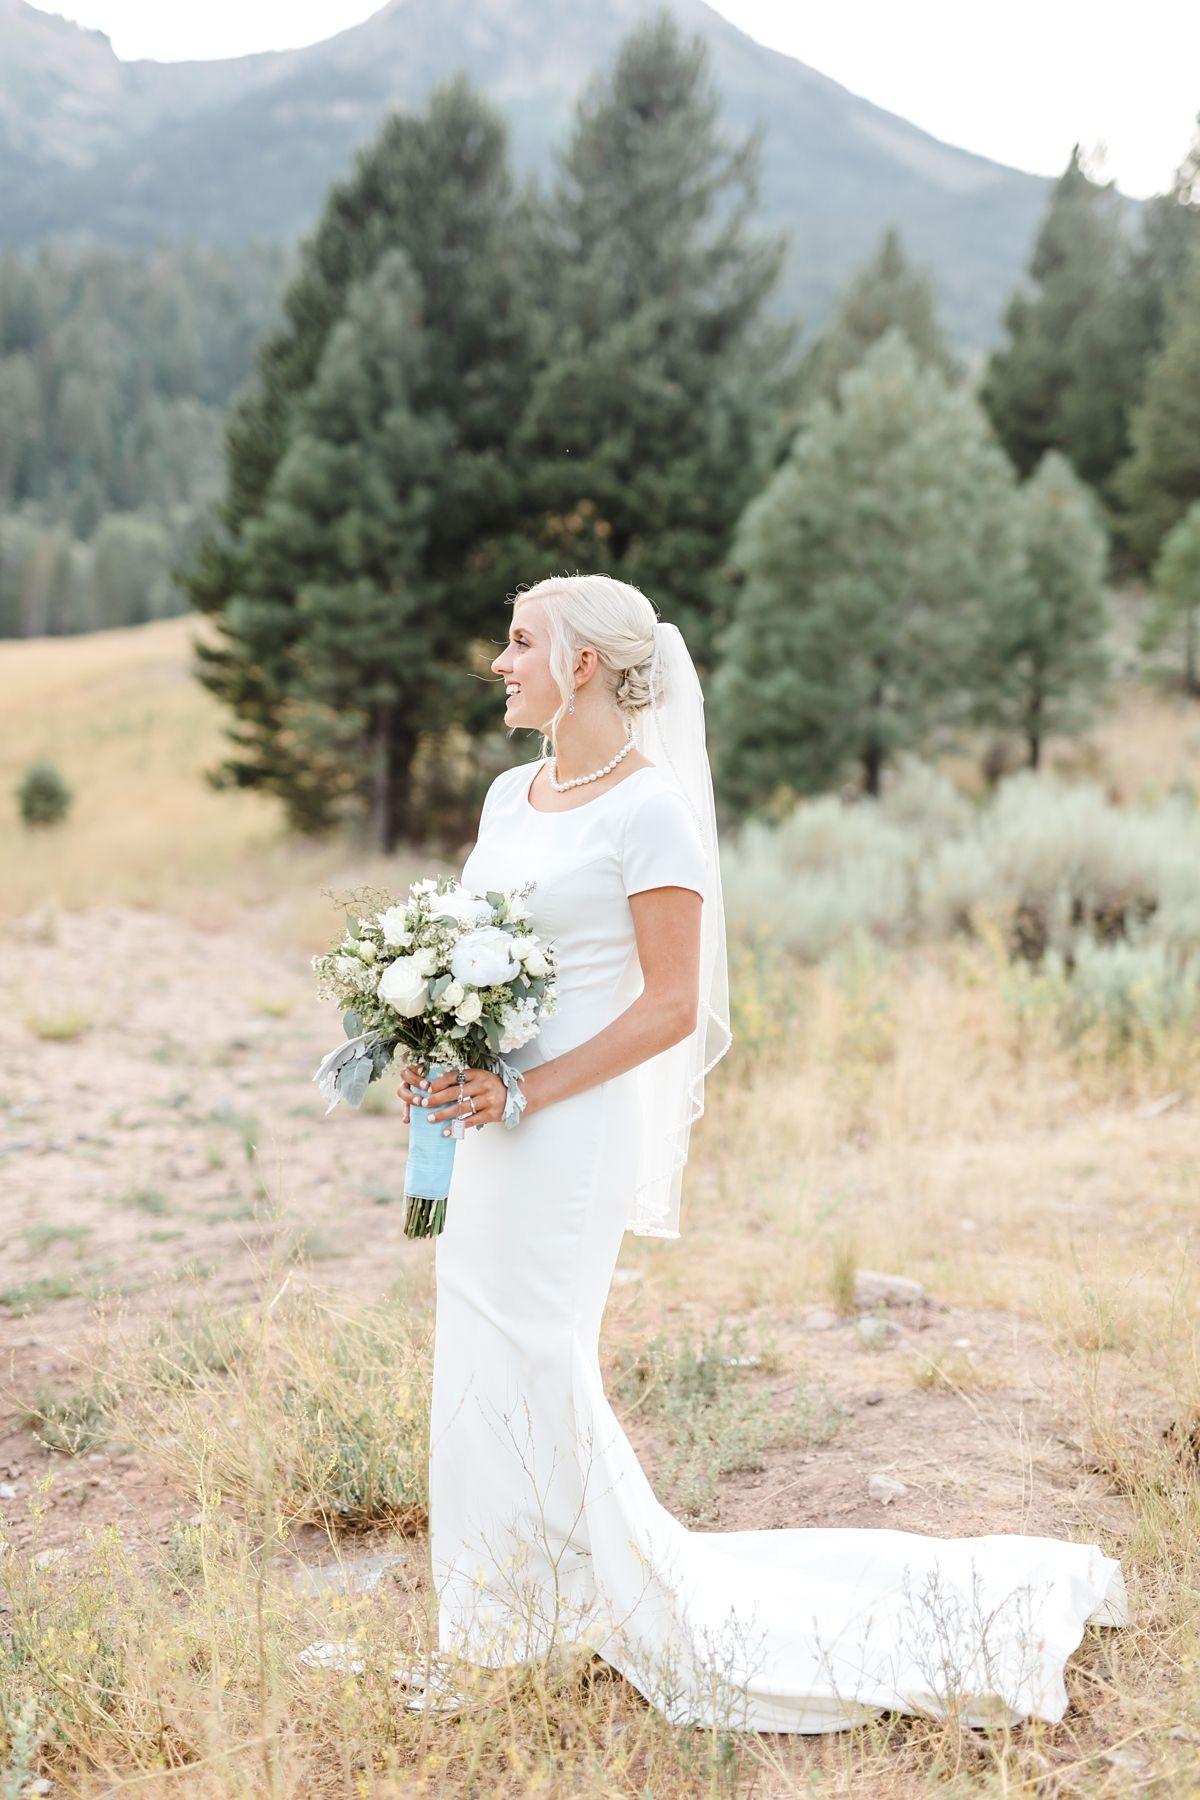 Summer Greenhouse Wedding At Shade Home Garden Orem Utah Greenhouse Wedding Wedding Dress Photography Utah Wedding Dress